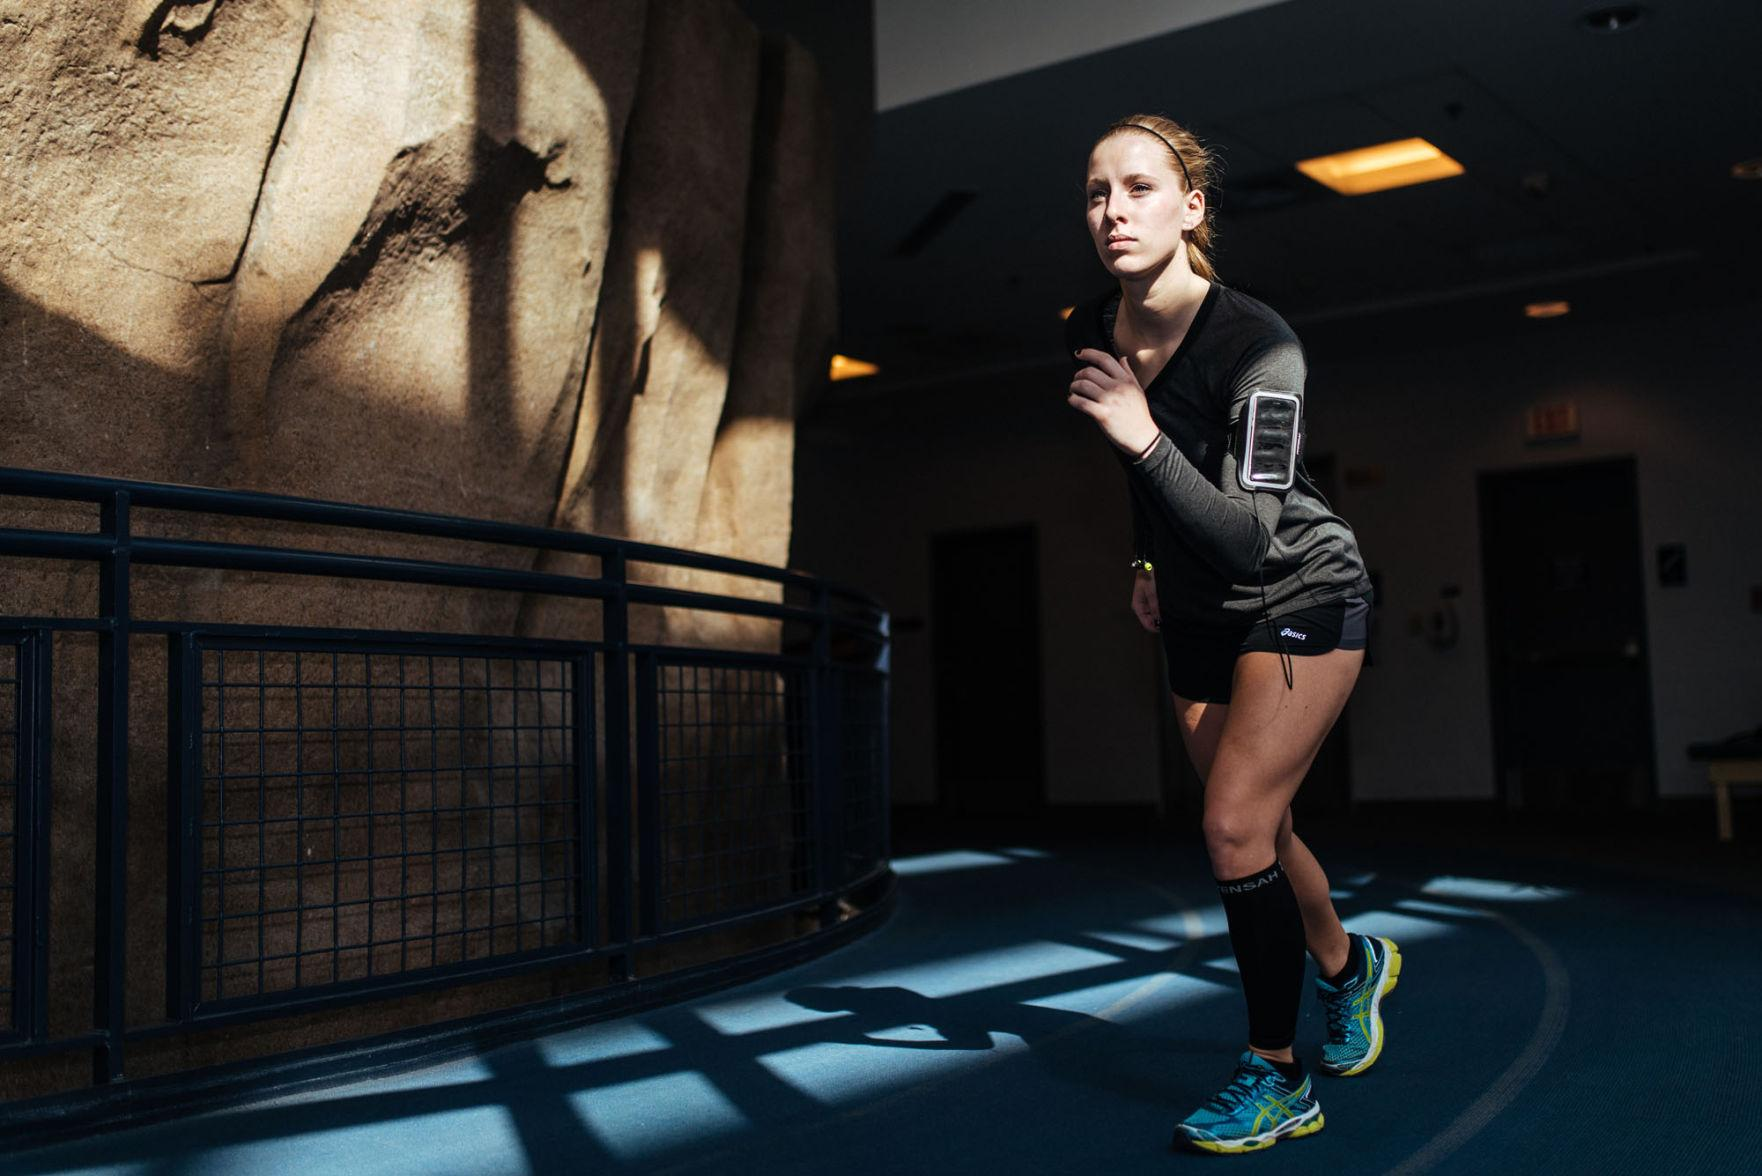 Magdalena Wierzchucki prepares for the Christie Clinic Illinois Marathon in April.